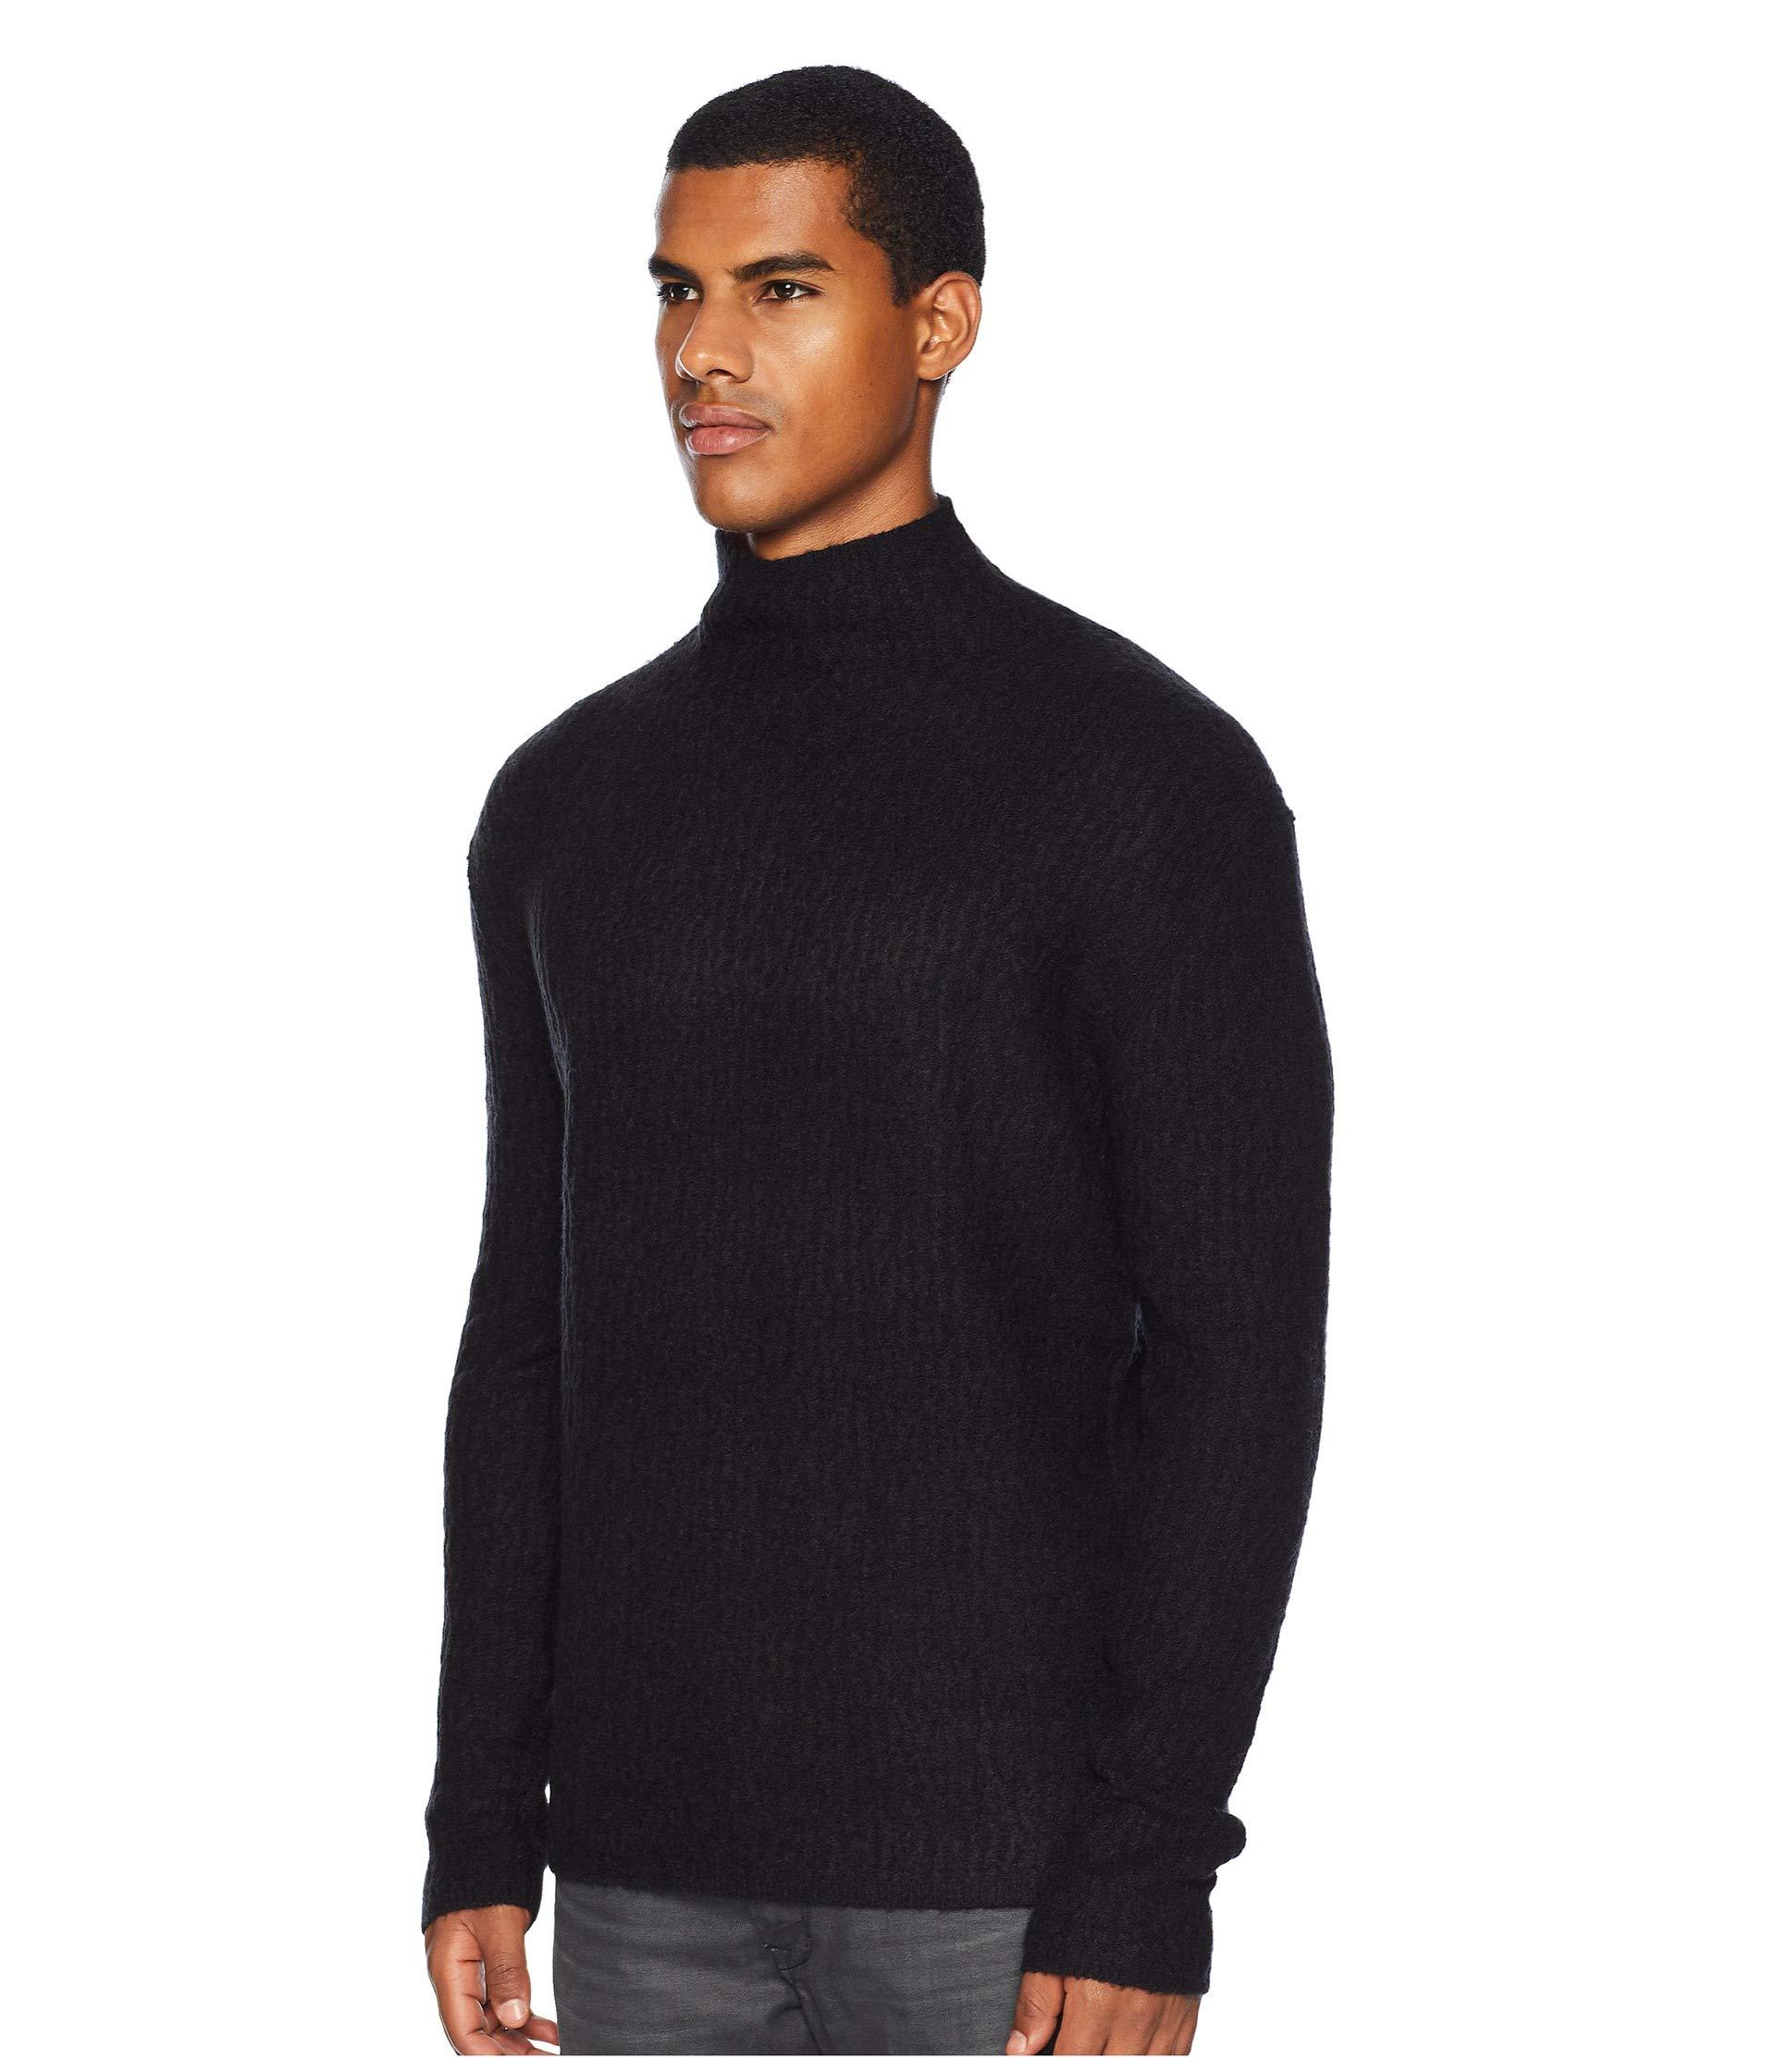 Y2552u3 Black Long Mock Collection Sleeve John Varvatos Neck Cable PwqCZZ0